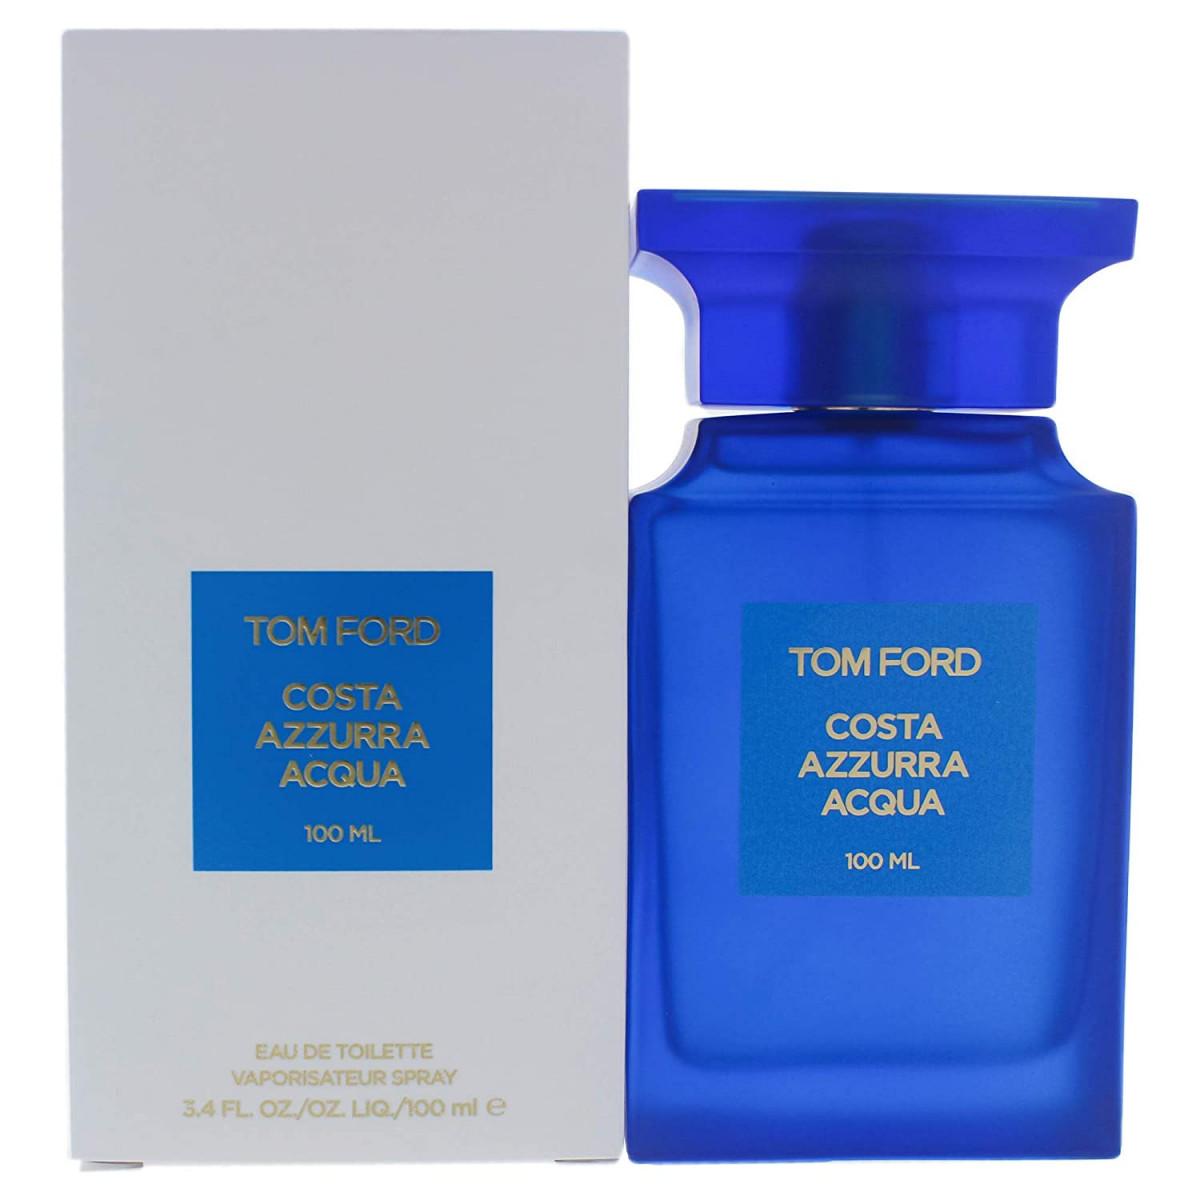 Tom Ford Costa Azzurra Acqua edp 100ml (лиц.)